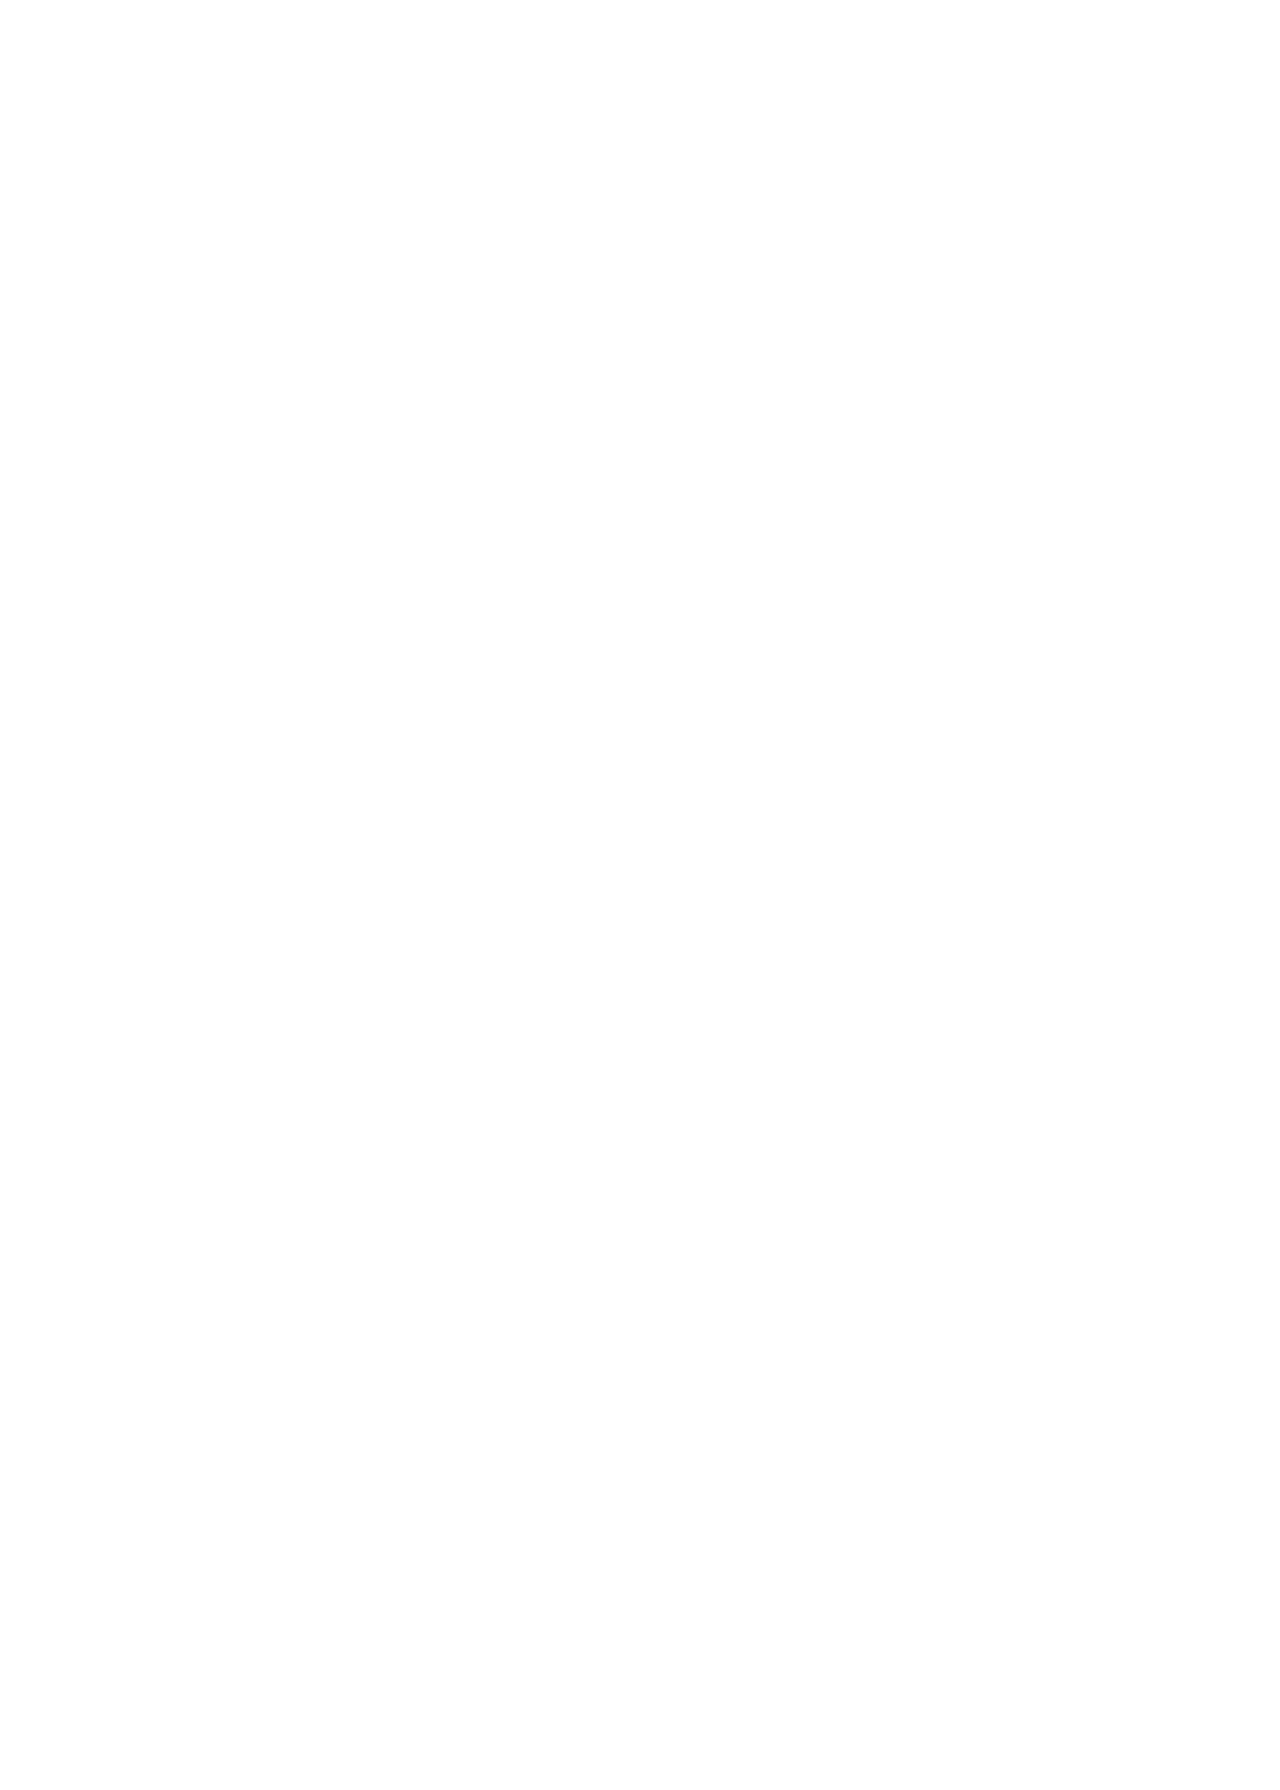 [Purin Kai Yoghurt (Chiri)] CxMxK NOTE X -cross- Soushuuhen [Digital] 156